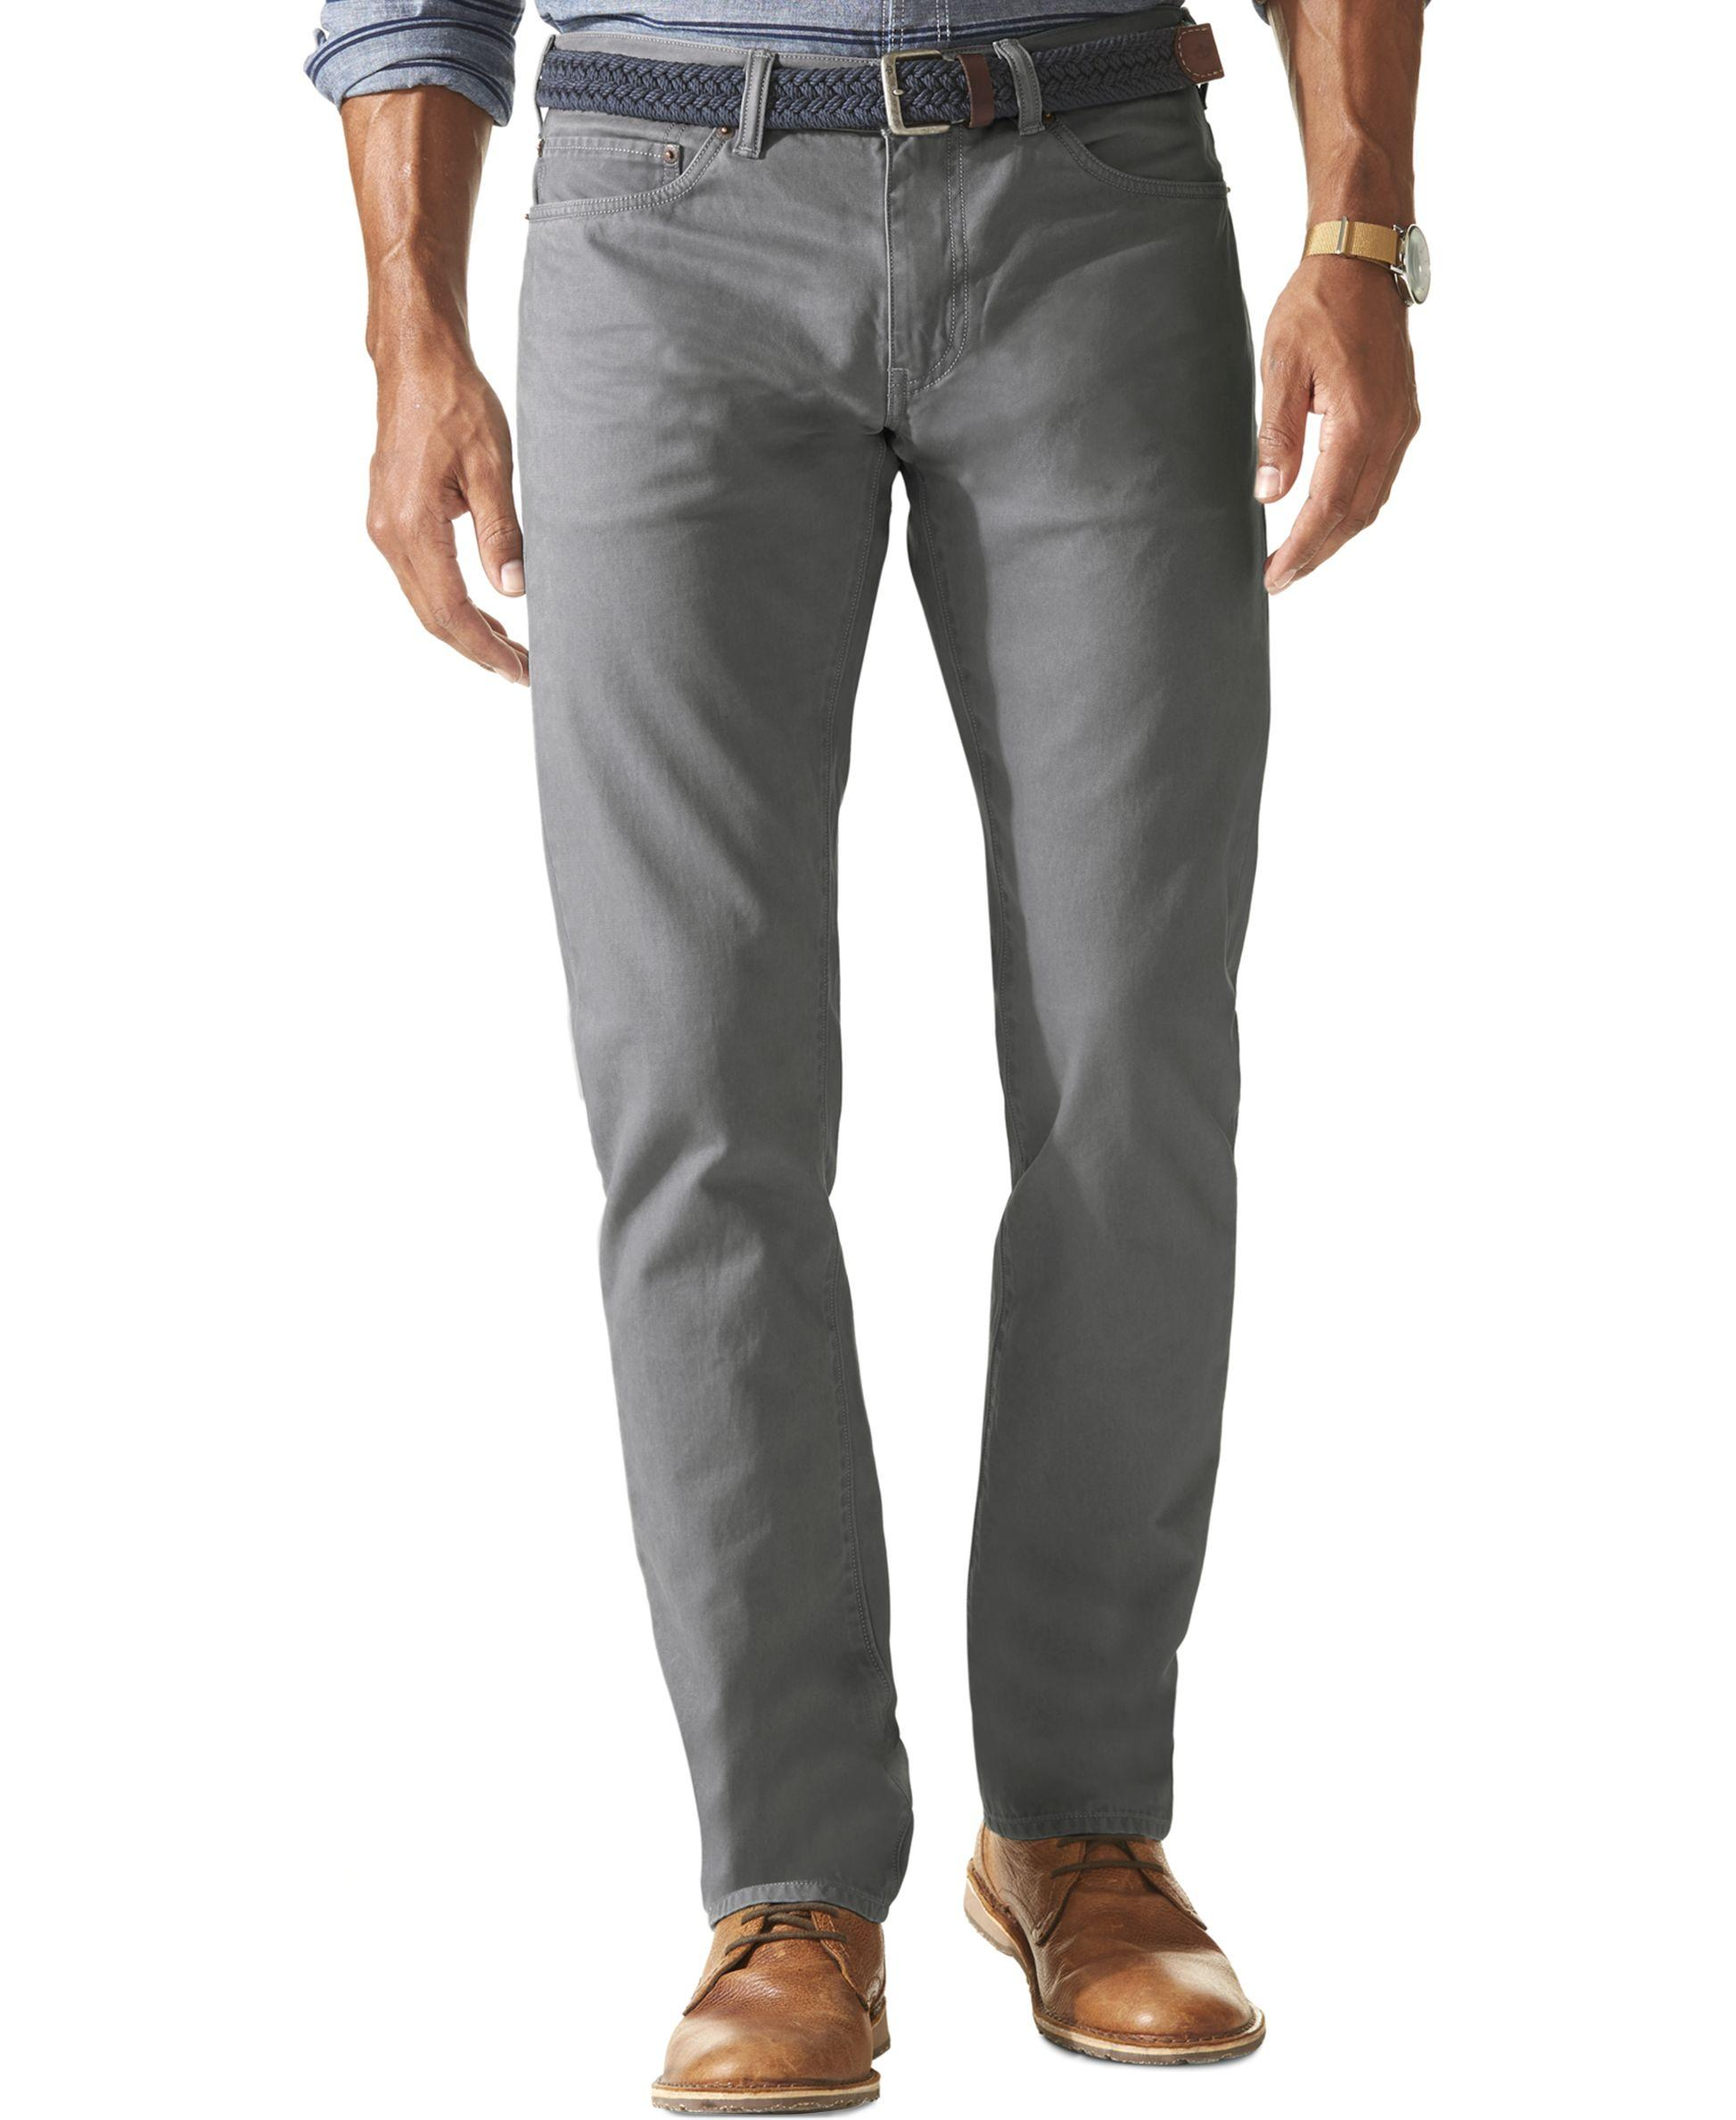 Dockers Jean Cut Slim Fit Sateen Pants D1 In Gray For Men